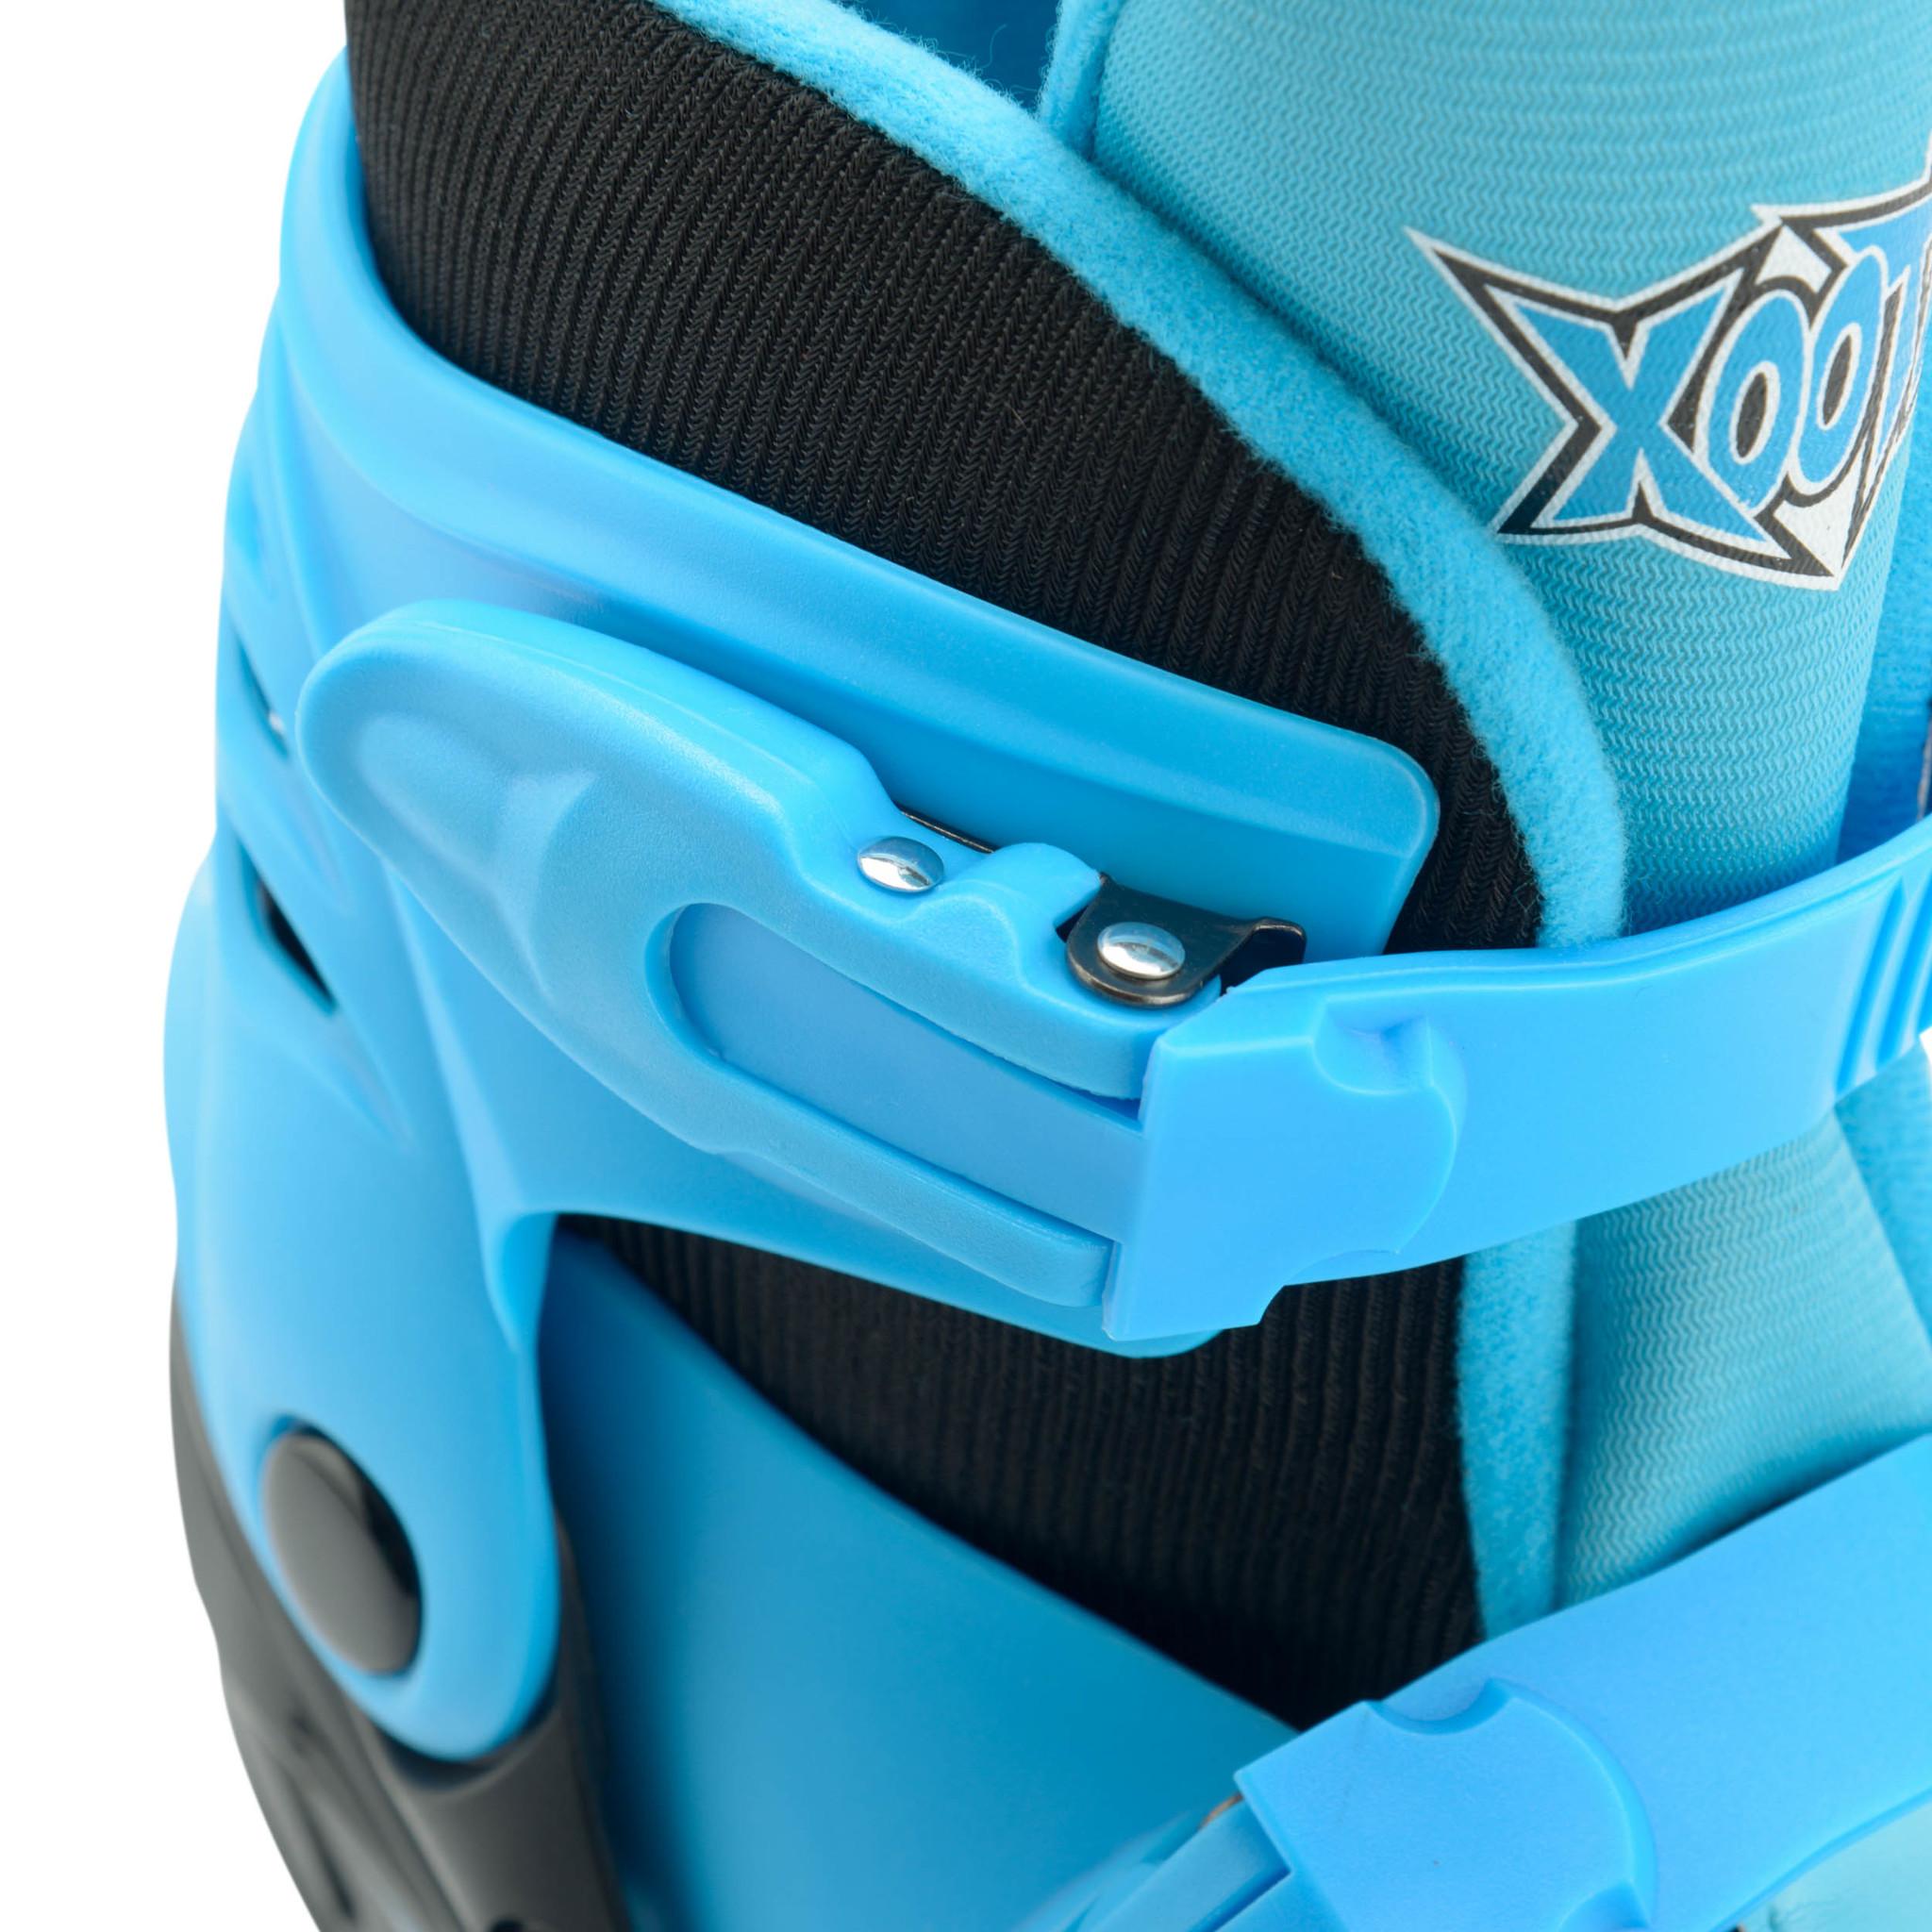 клады TY6064 xootz quad skates blue